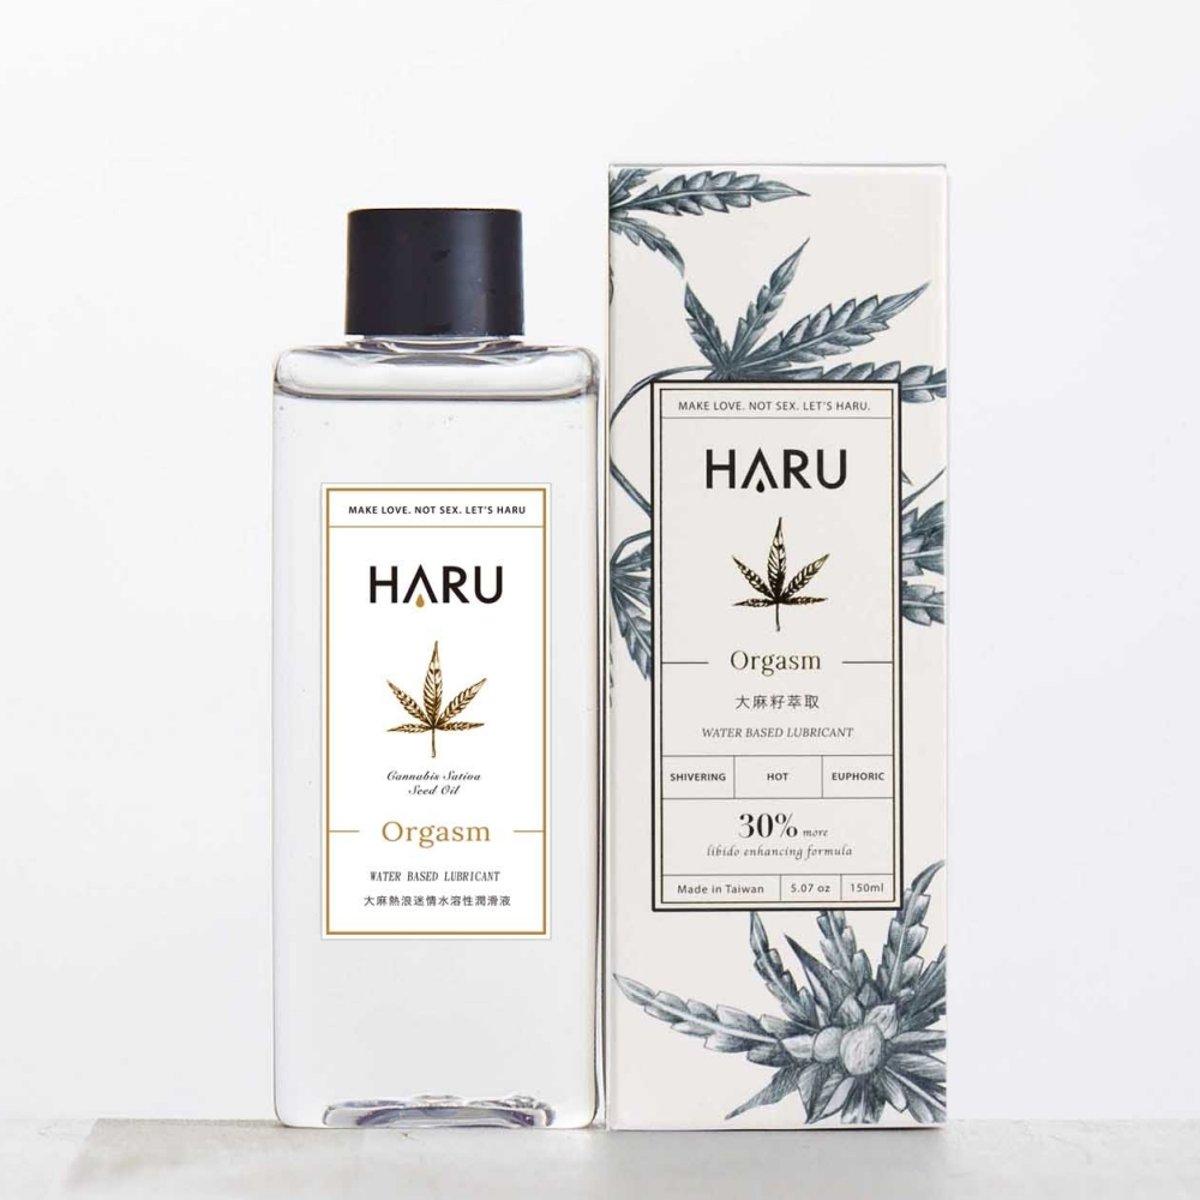 HARU|ORGASM 大麻熱浪迷情熱感潤滑液 的圖片